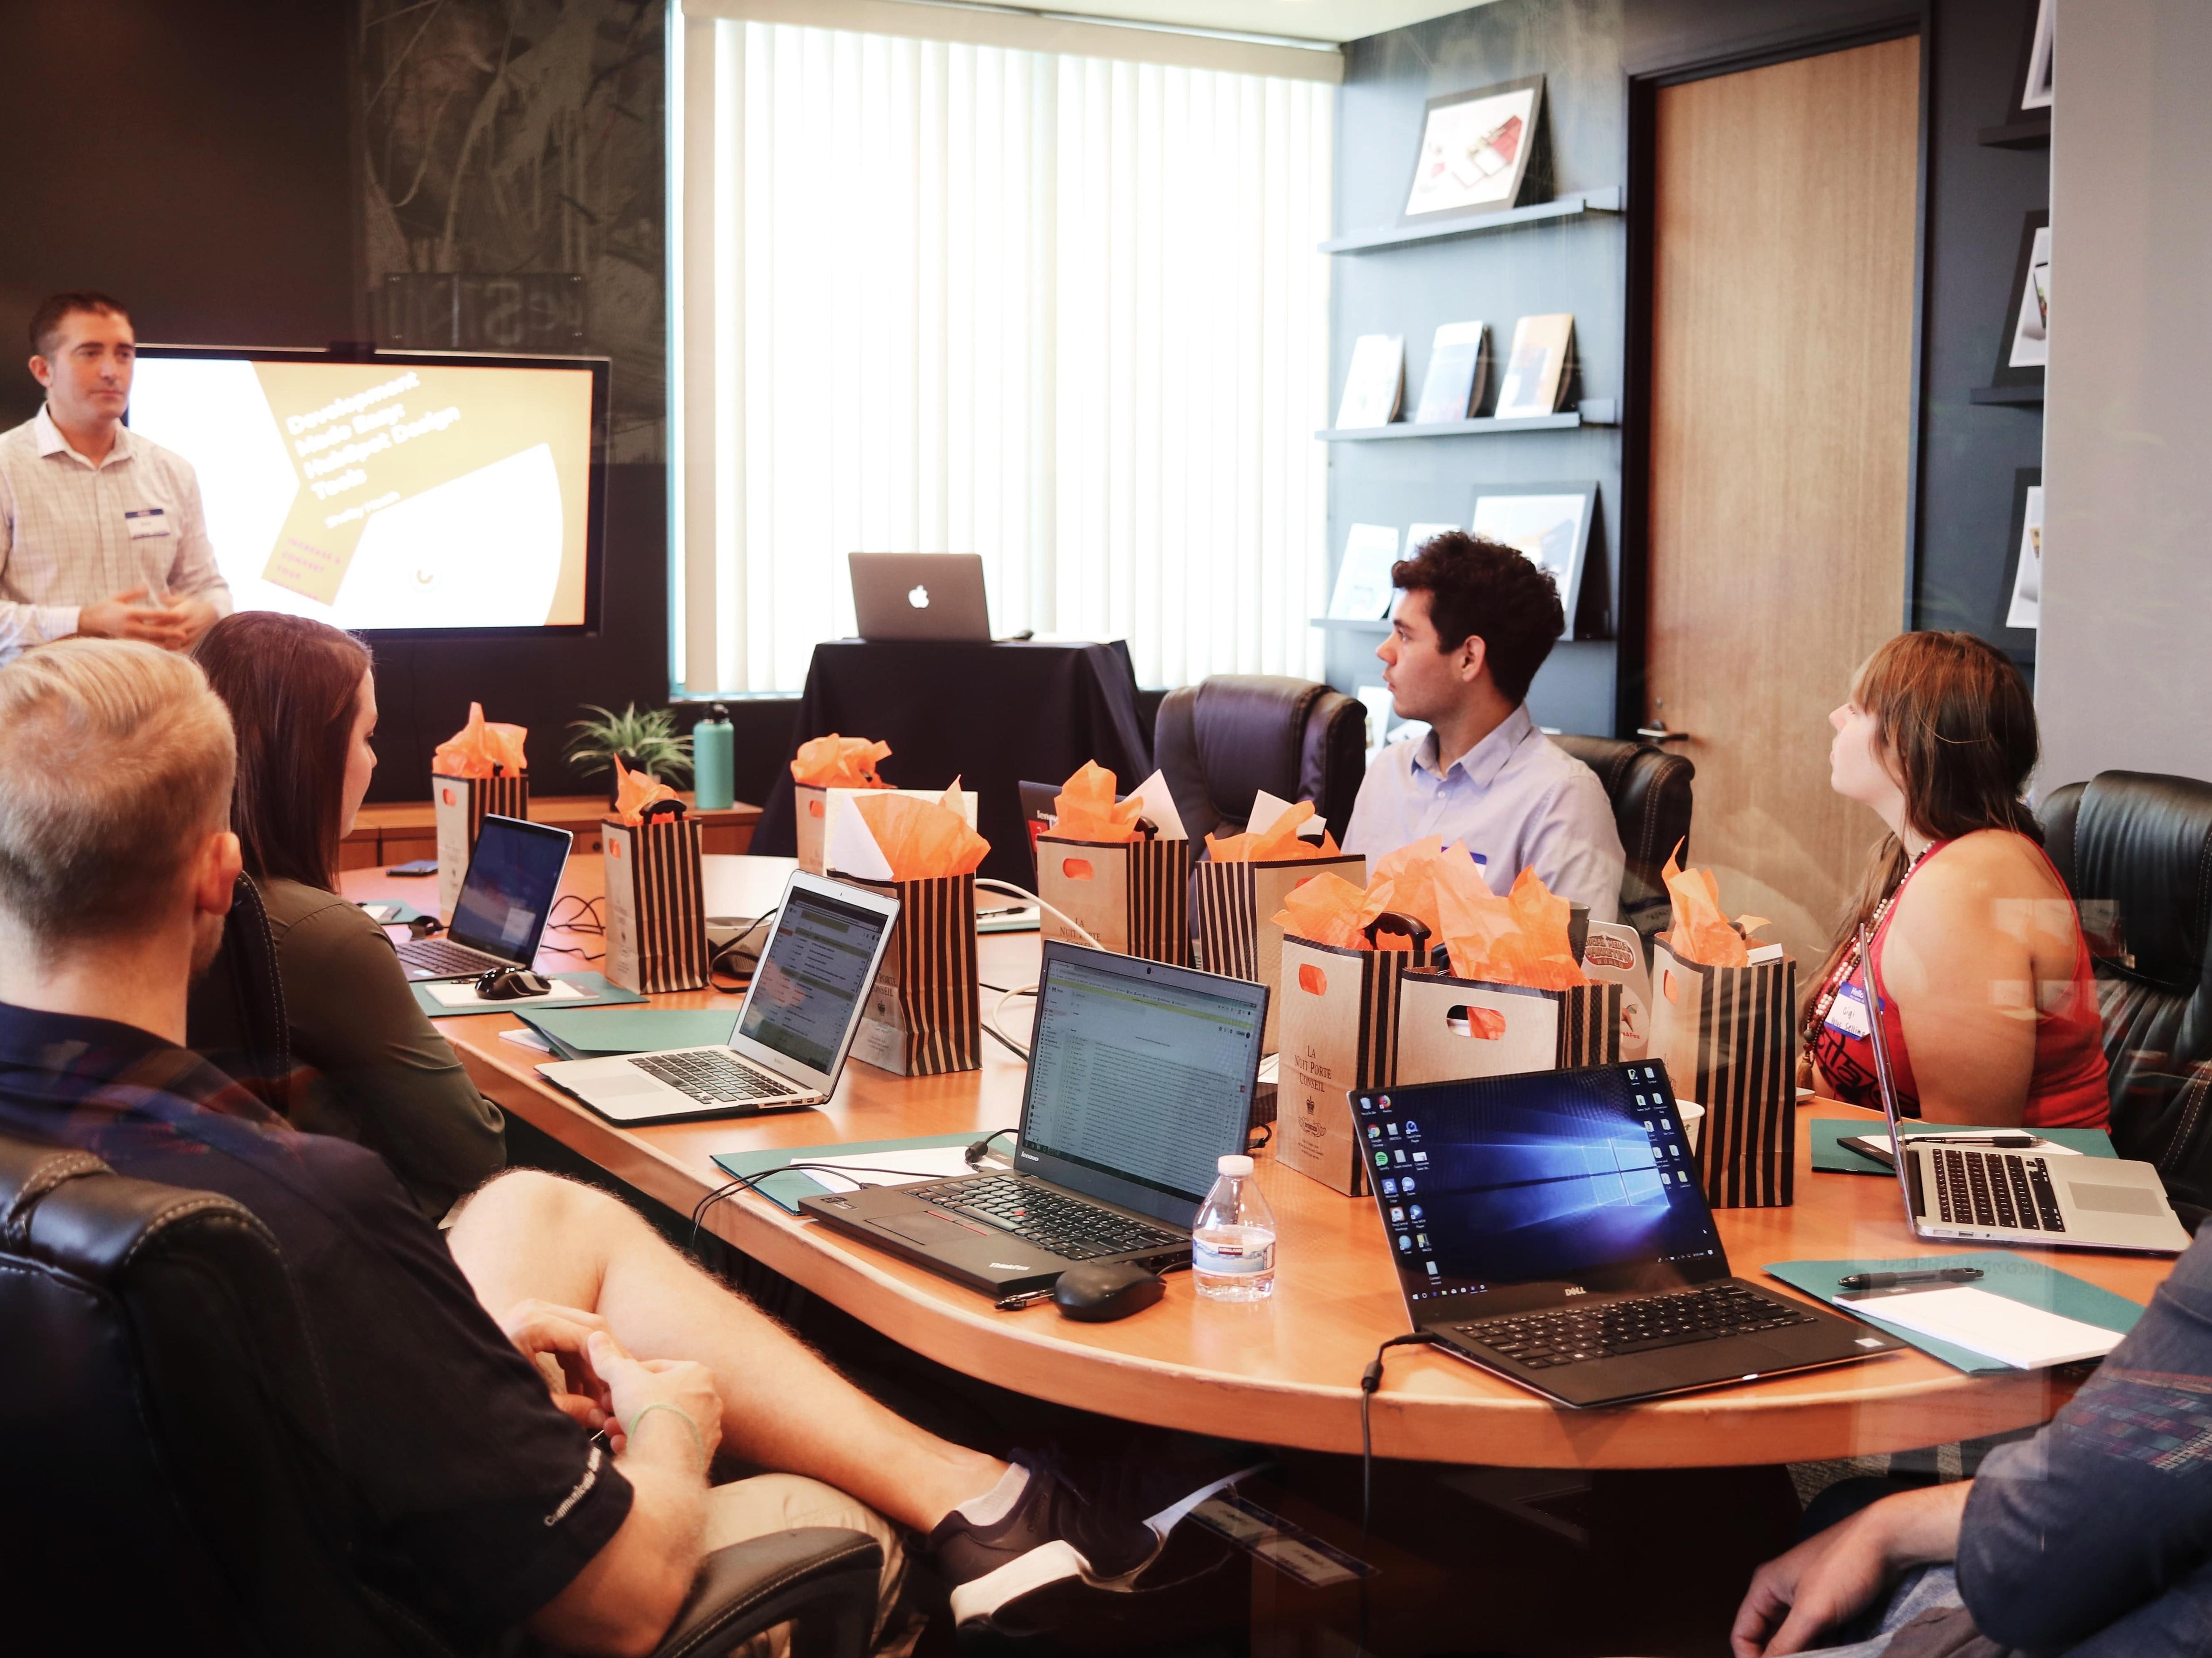 A customer advisory board meeting